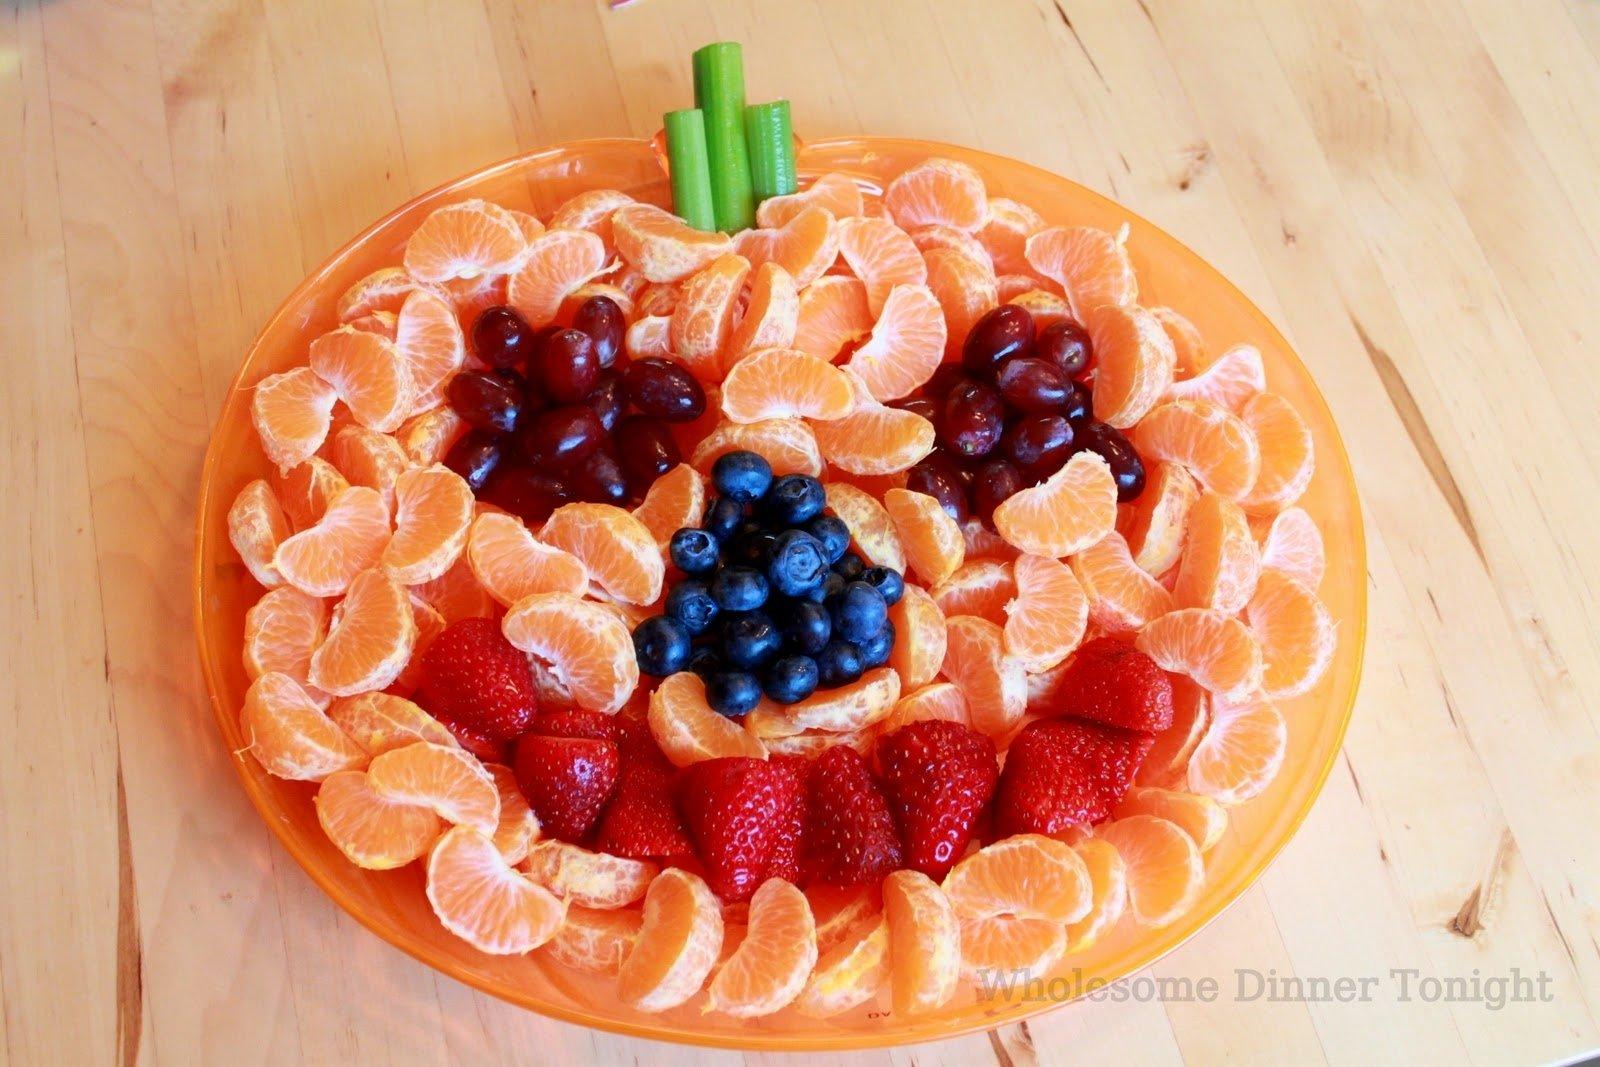 10 Cute Halloween Food Ideas For Parties top 15 paleo halloween treats party food ideas 4 2021